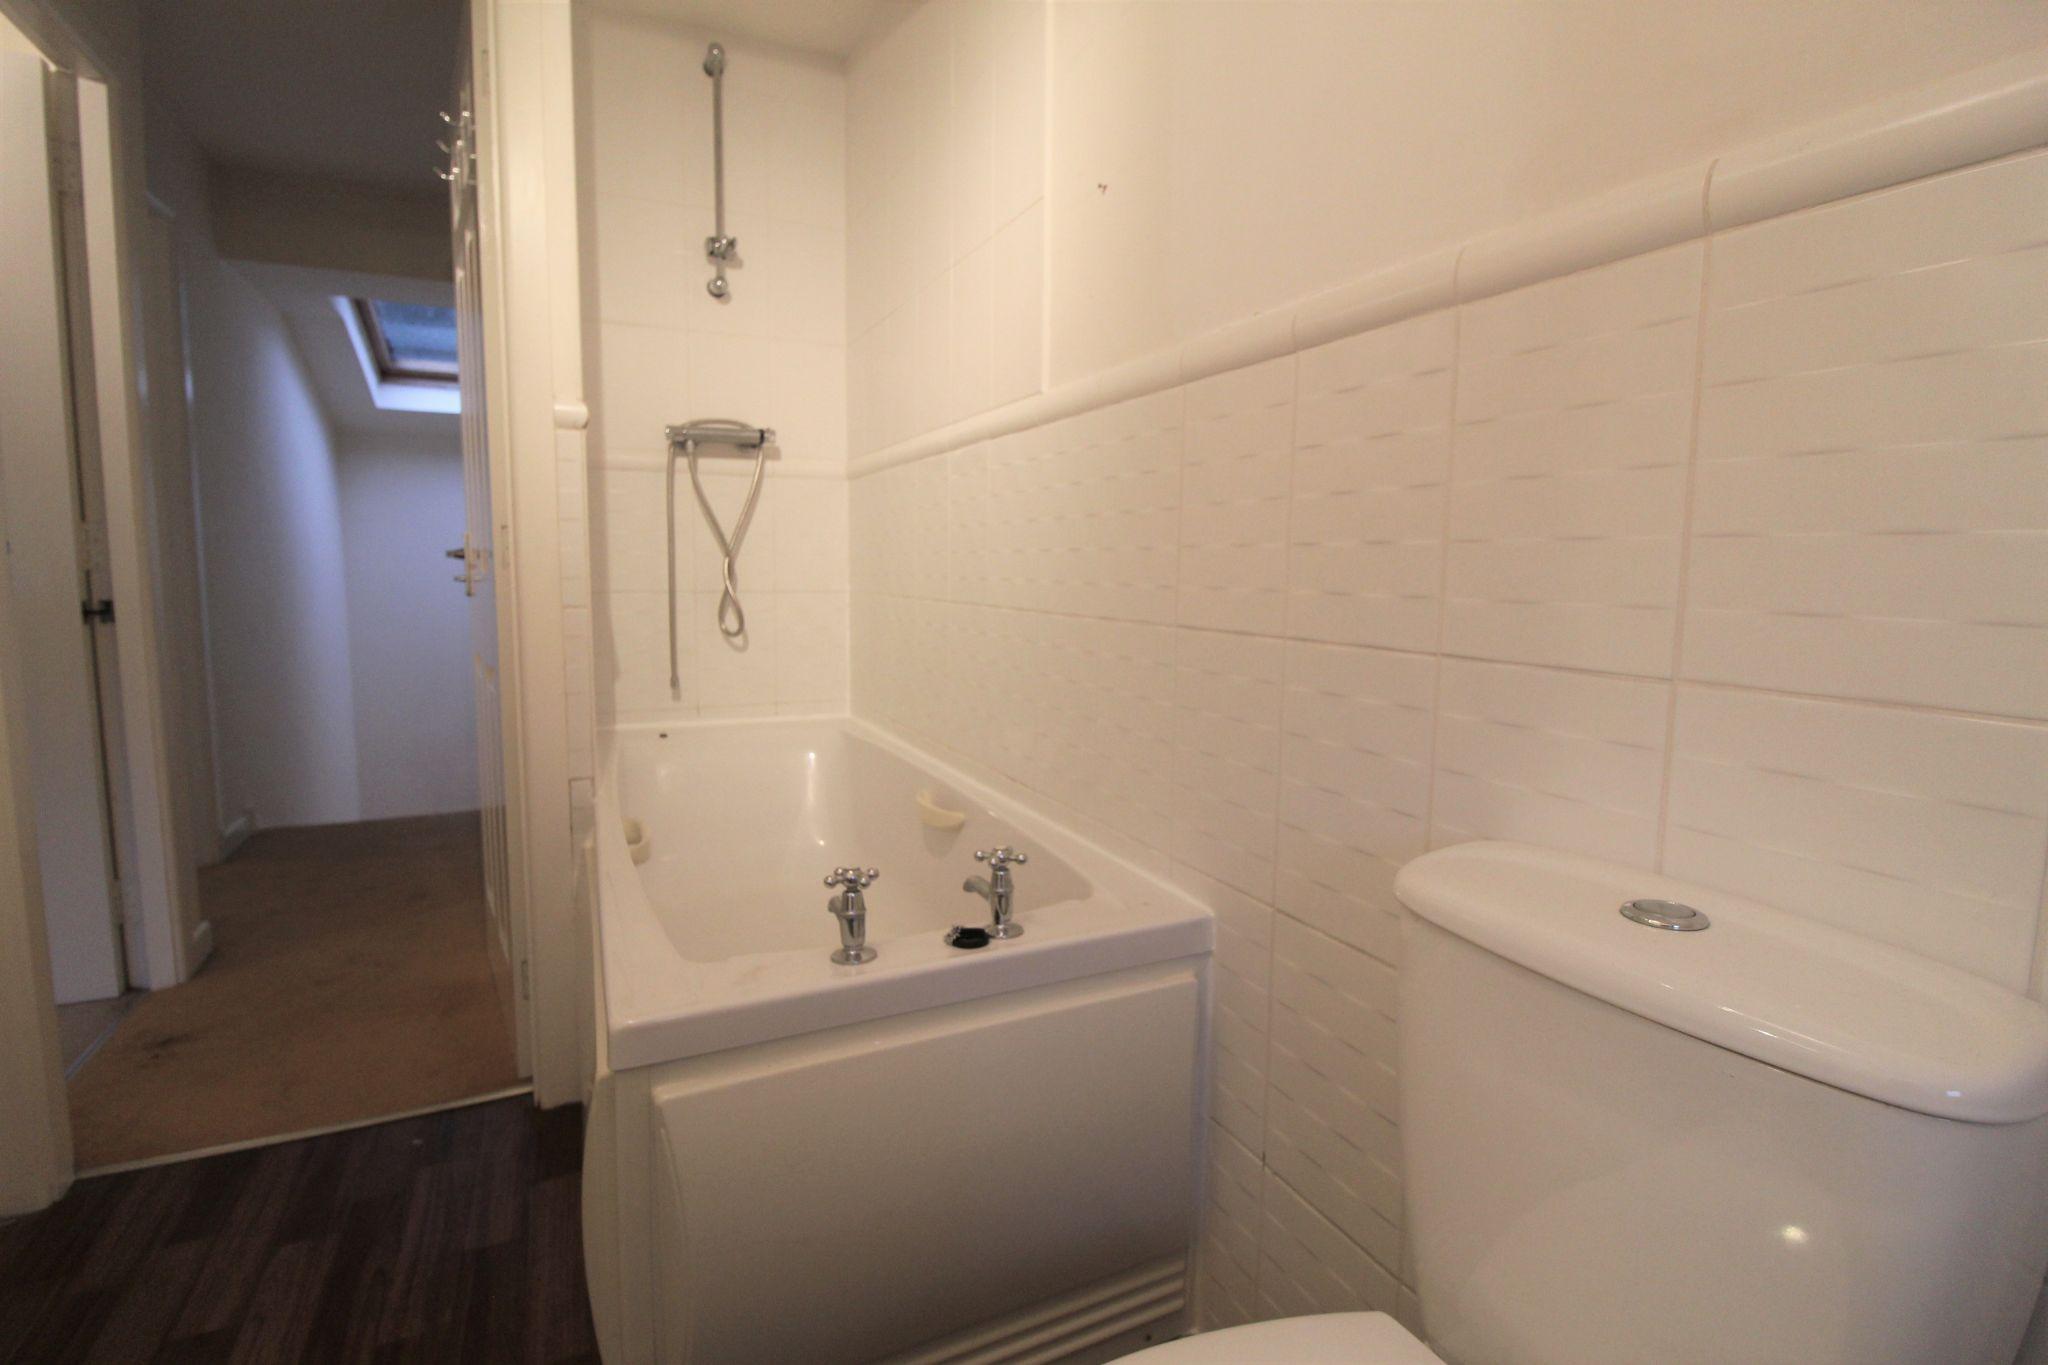 2 bedroom town house Let in Halifax - Bathroom